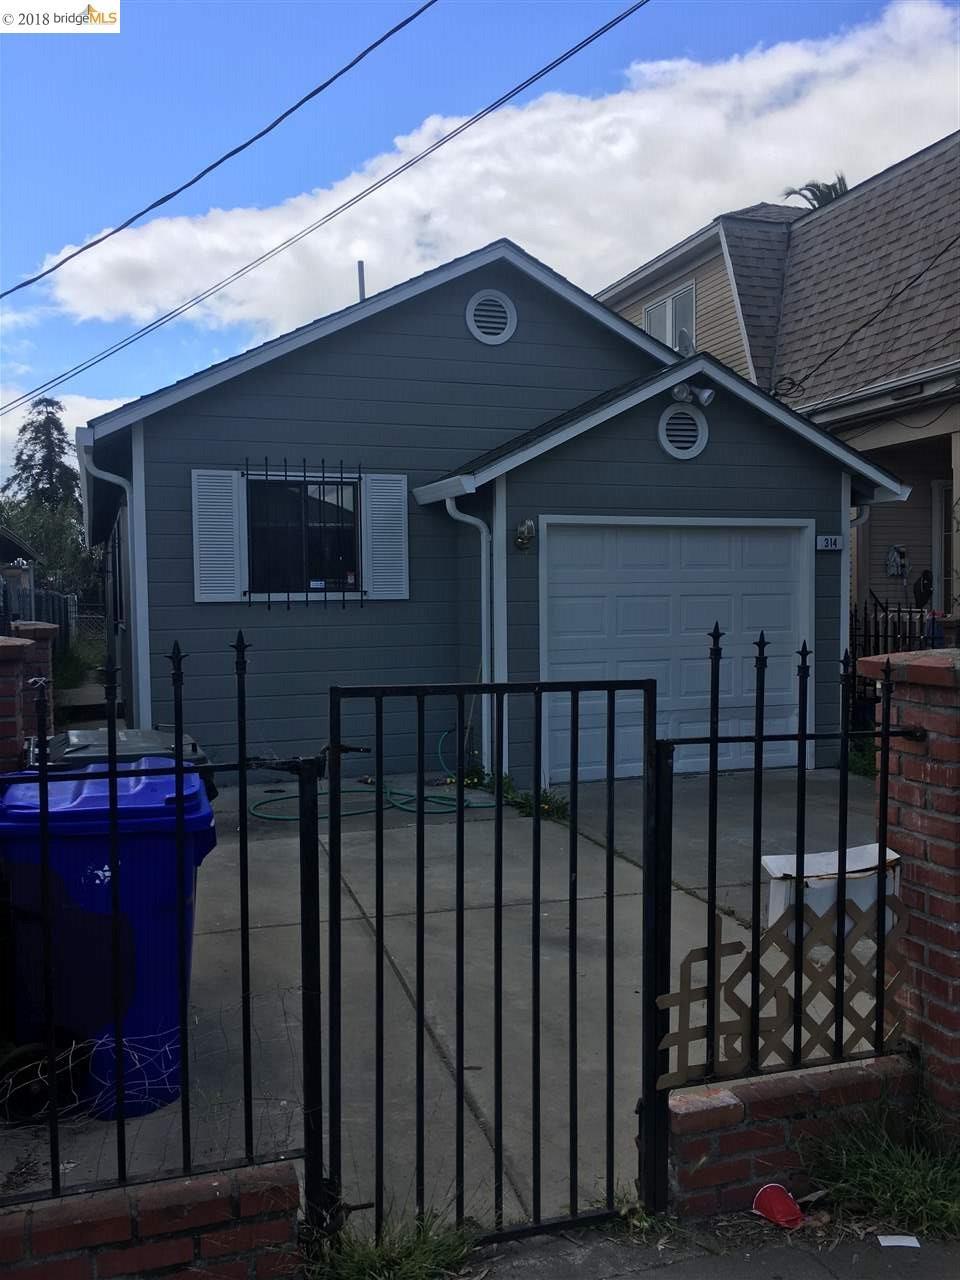 314 BISSELL AVE, RICHMOND, CA 94801